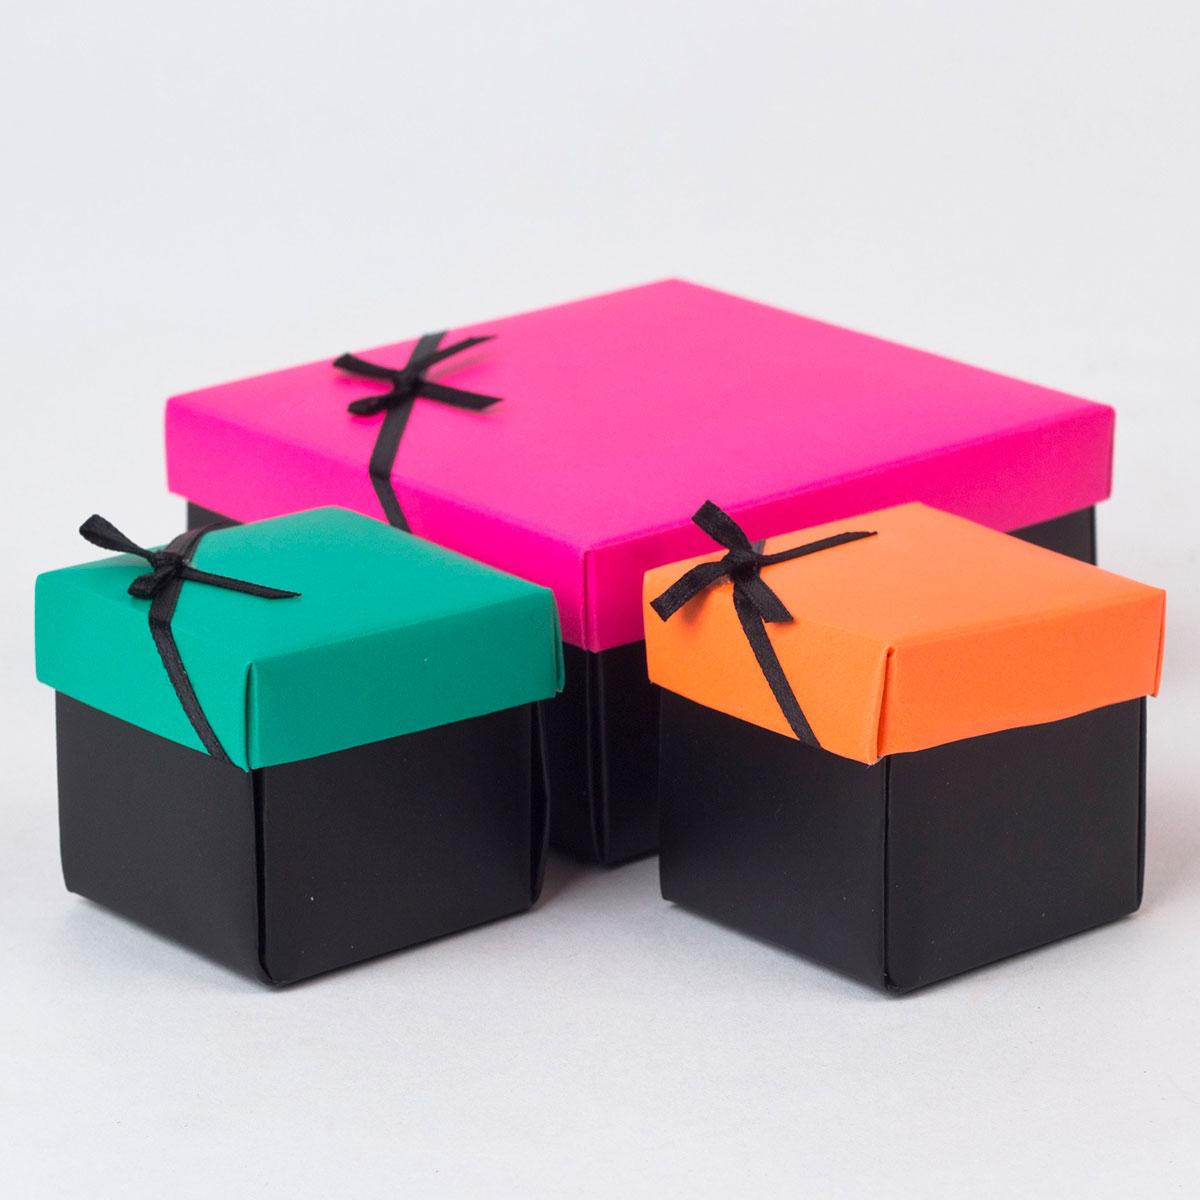 box-fedorafans.com